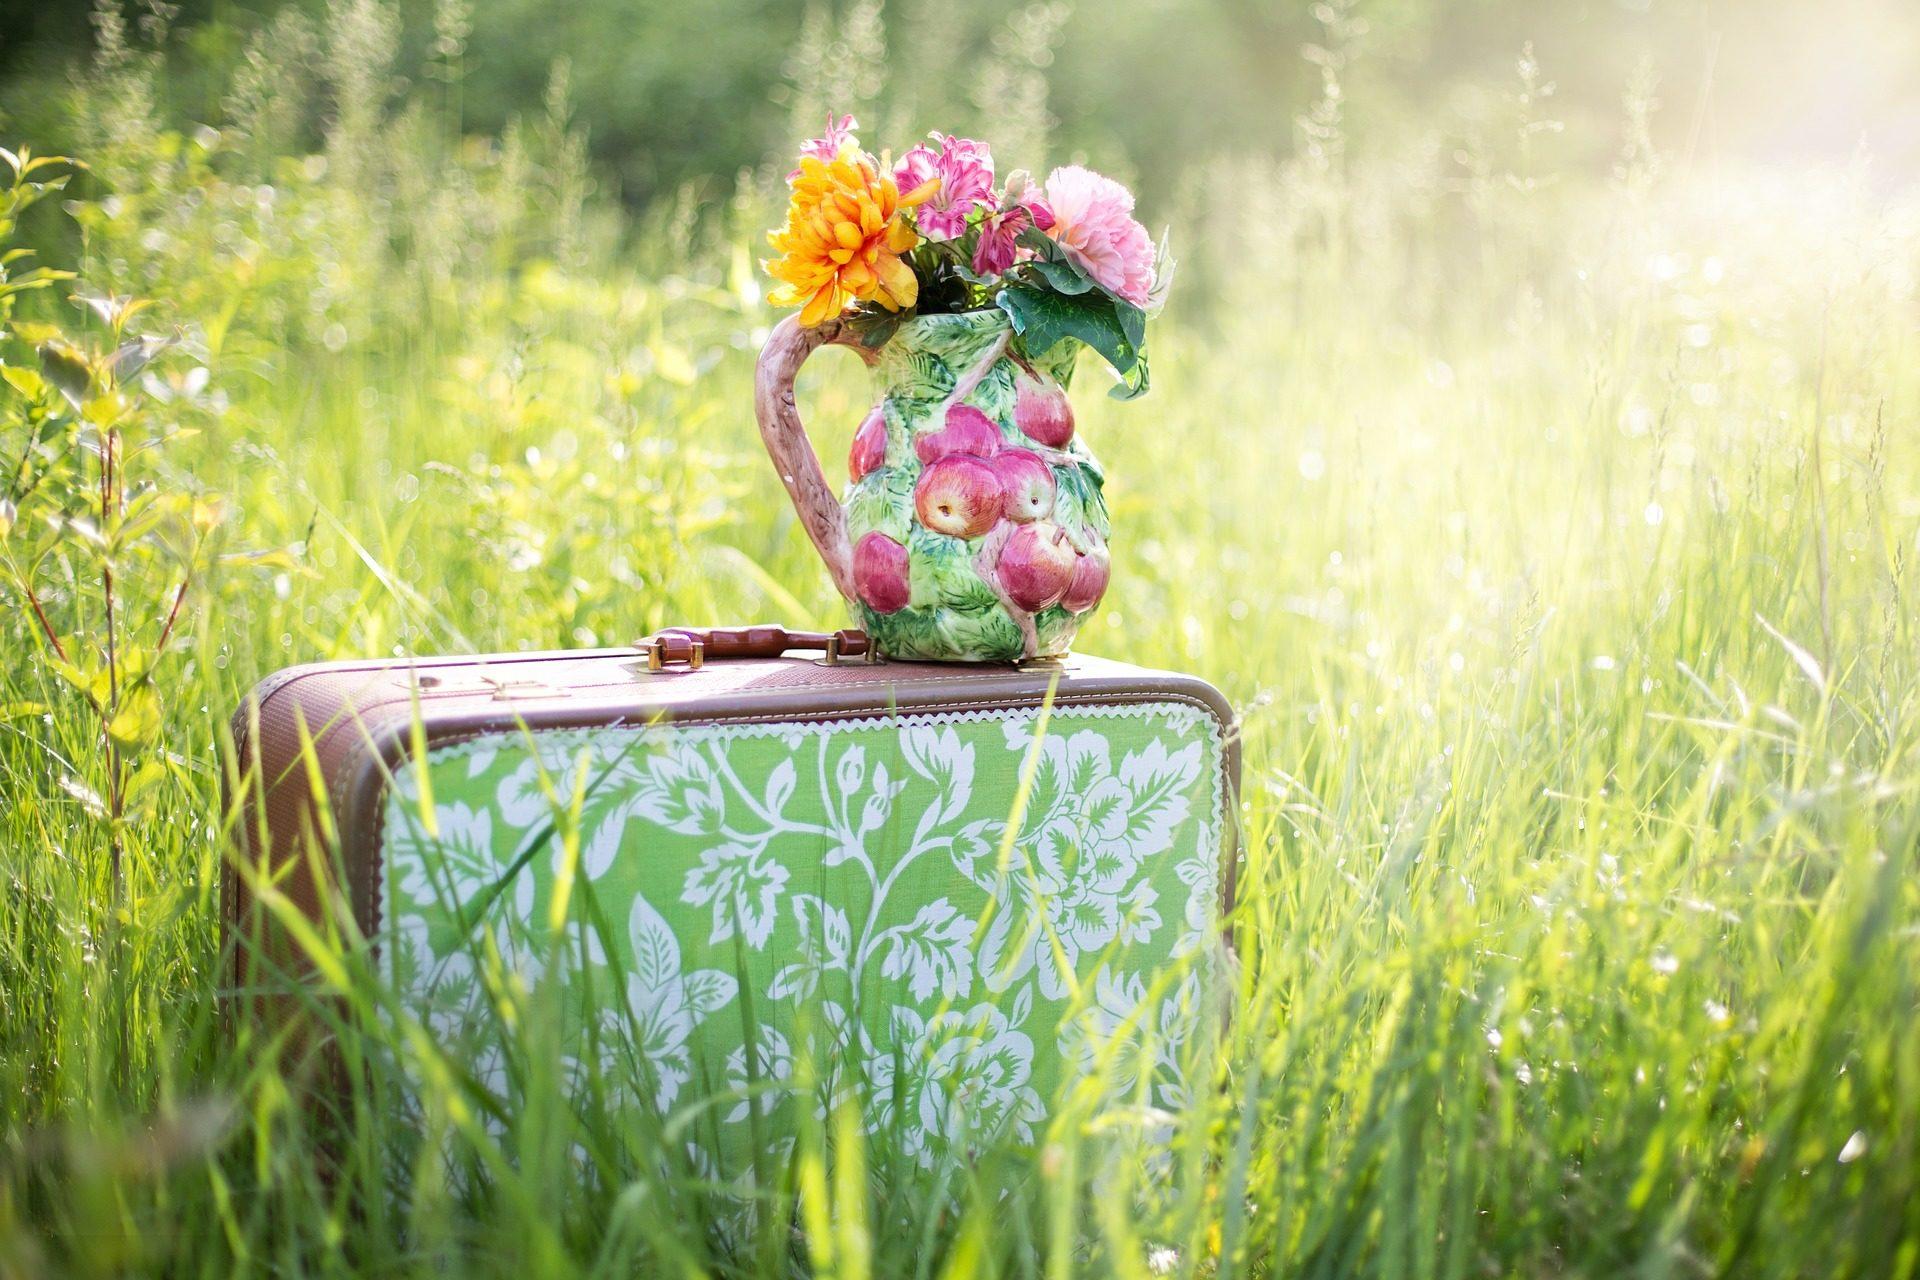 mala, vaso, flores, campo, grama - Papéis de parede HD - Professor-falken.com